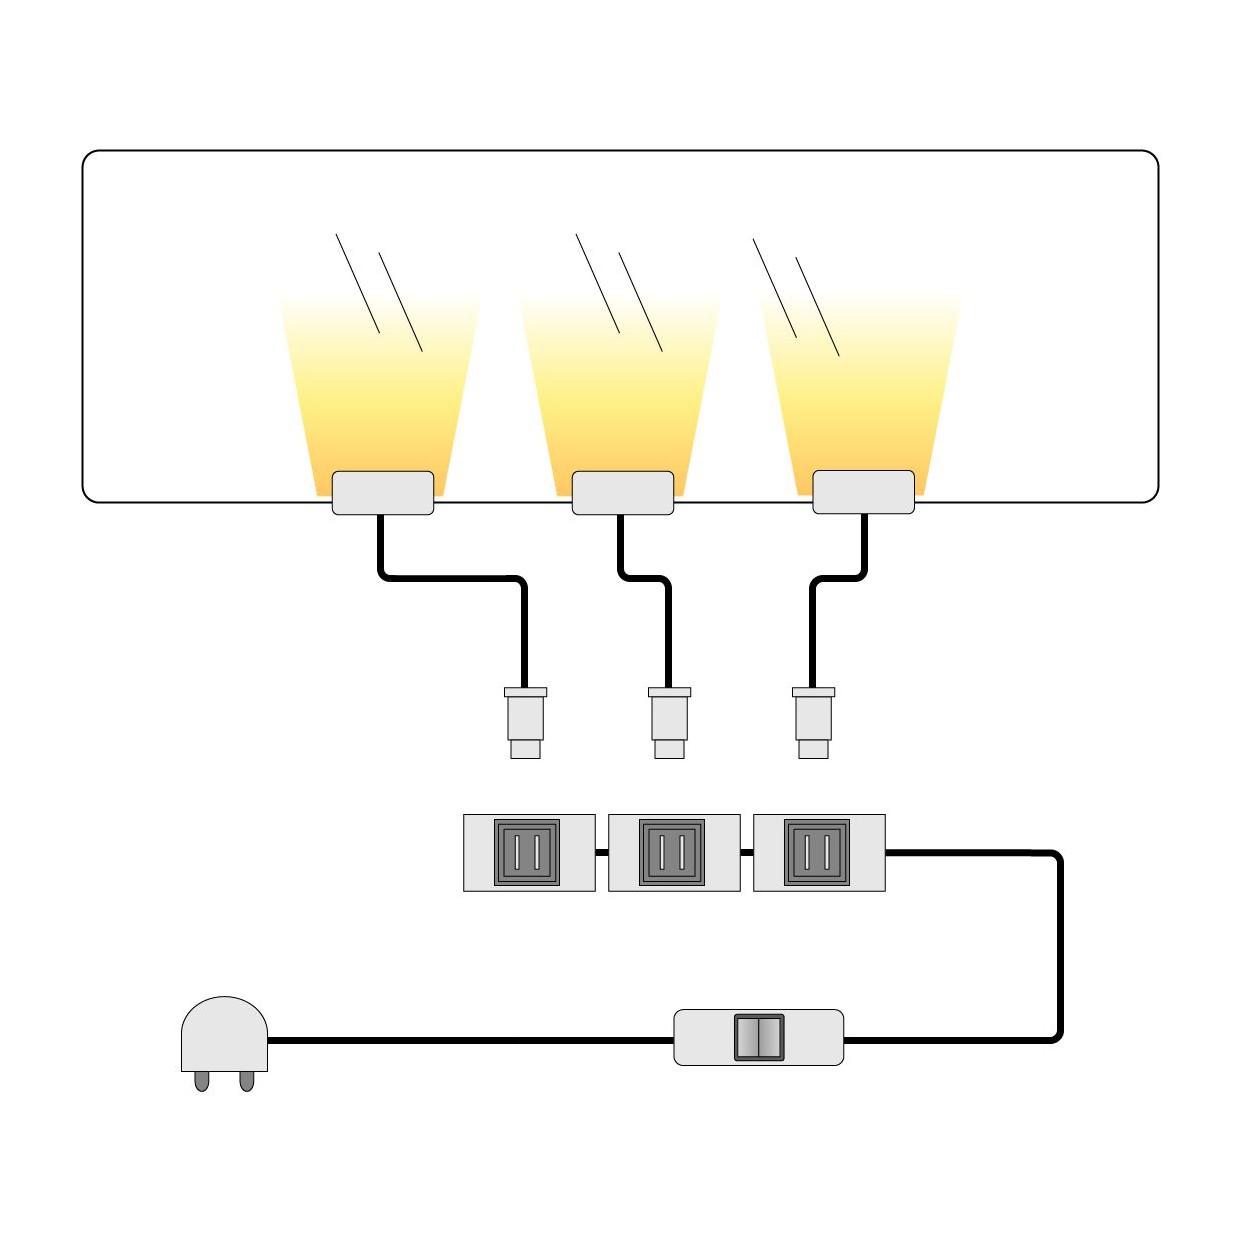 home24 LED-Glaskantenbeleuchtung Piorini | Lampen > Leuchtmittel > Led | mooved